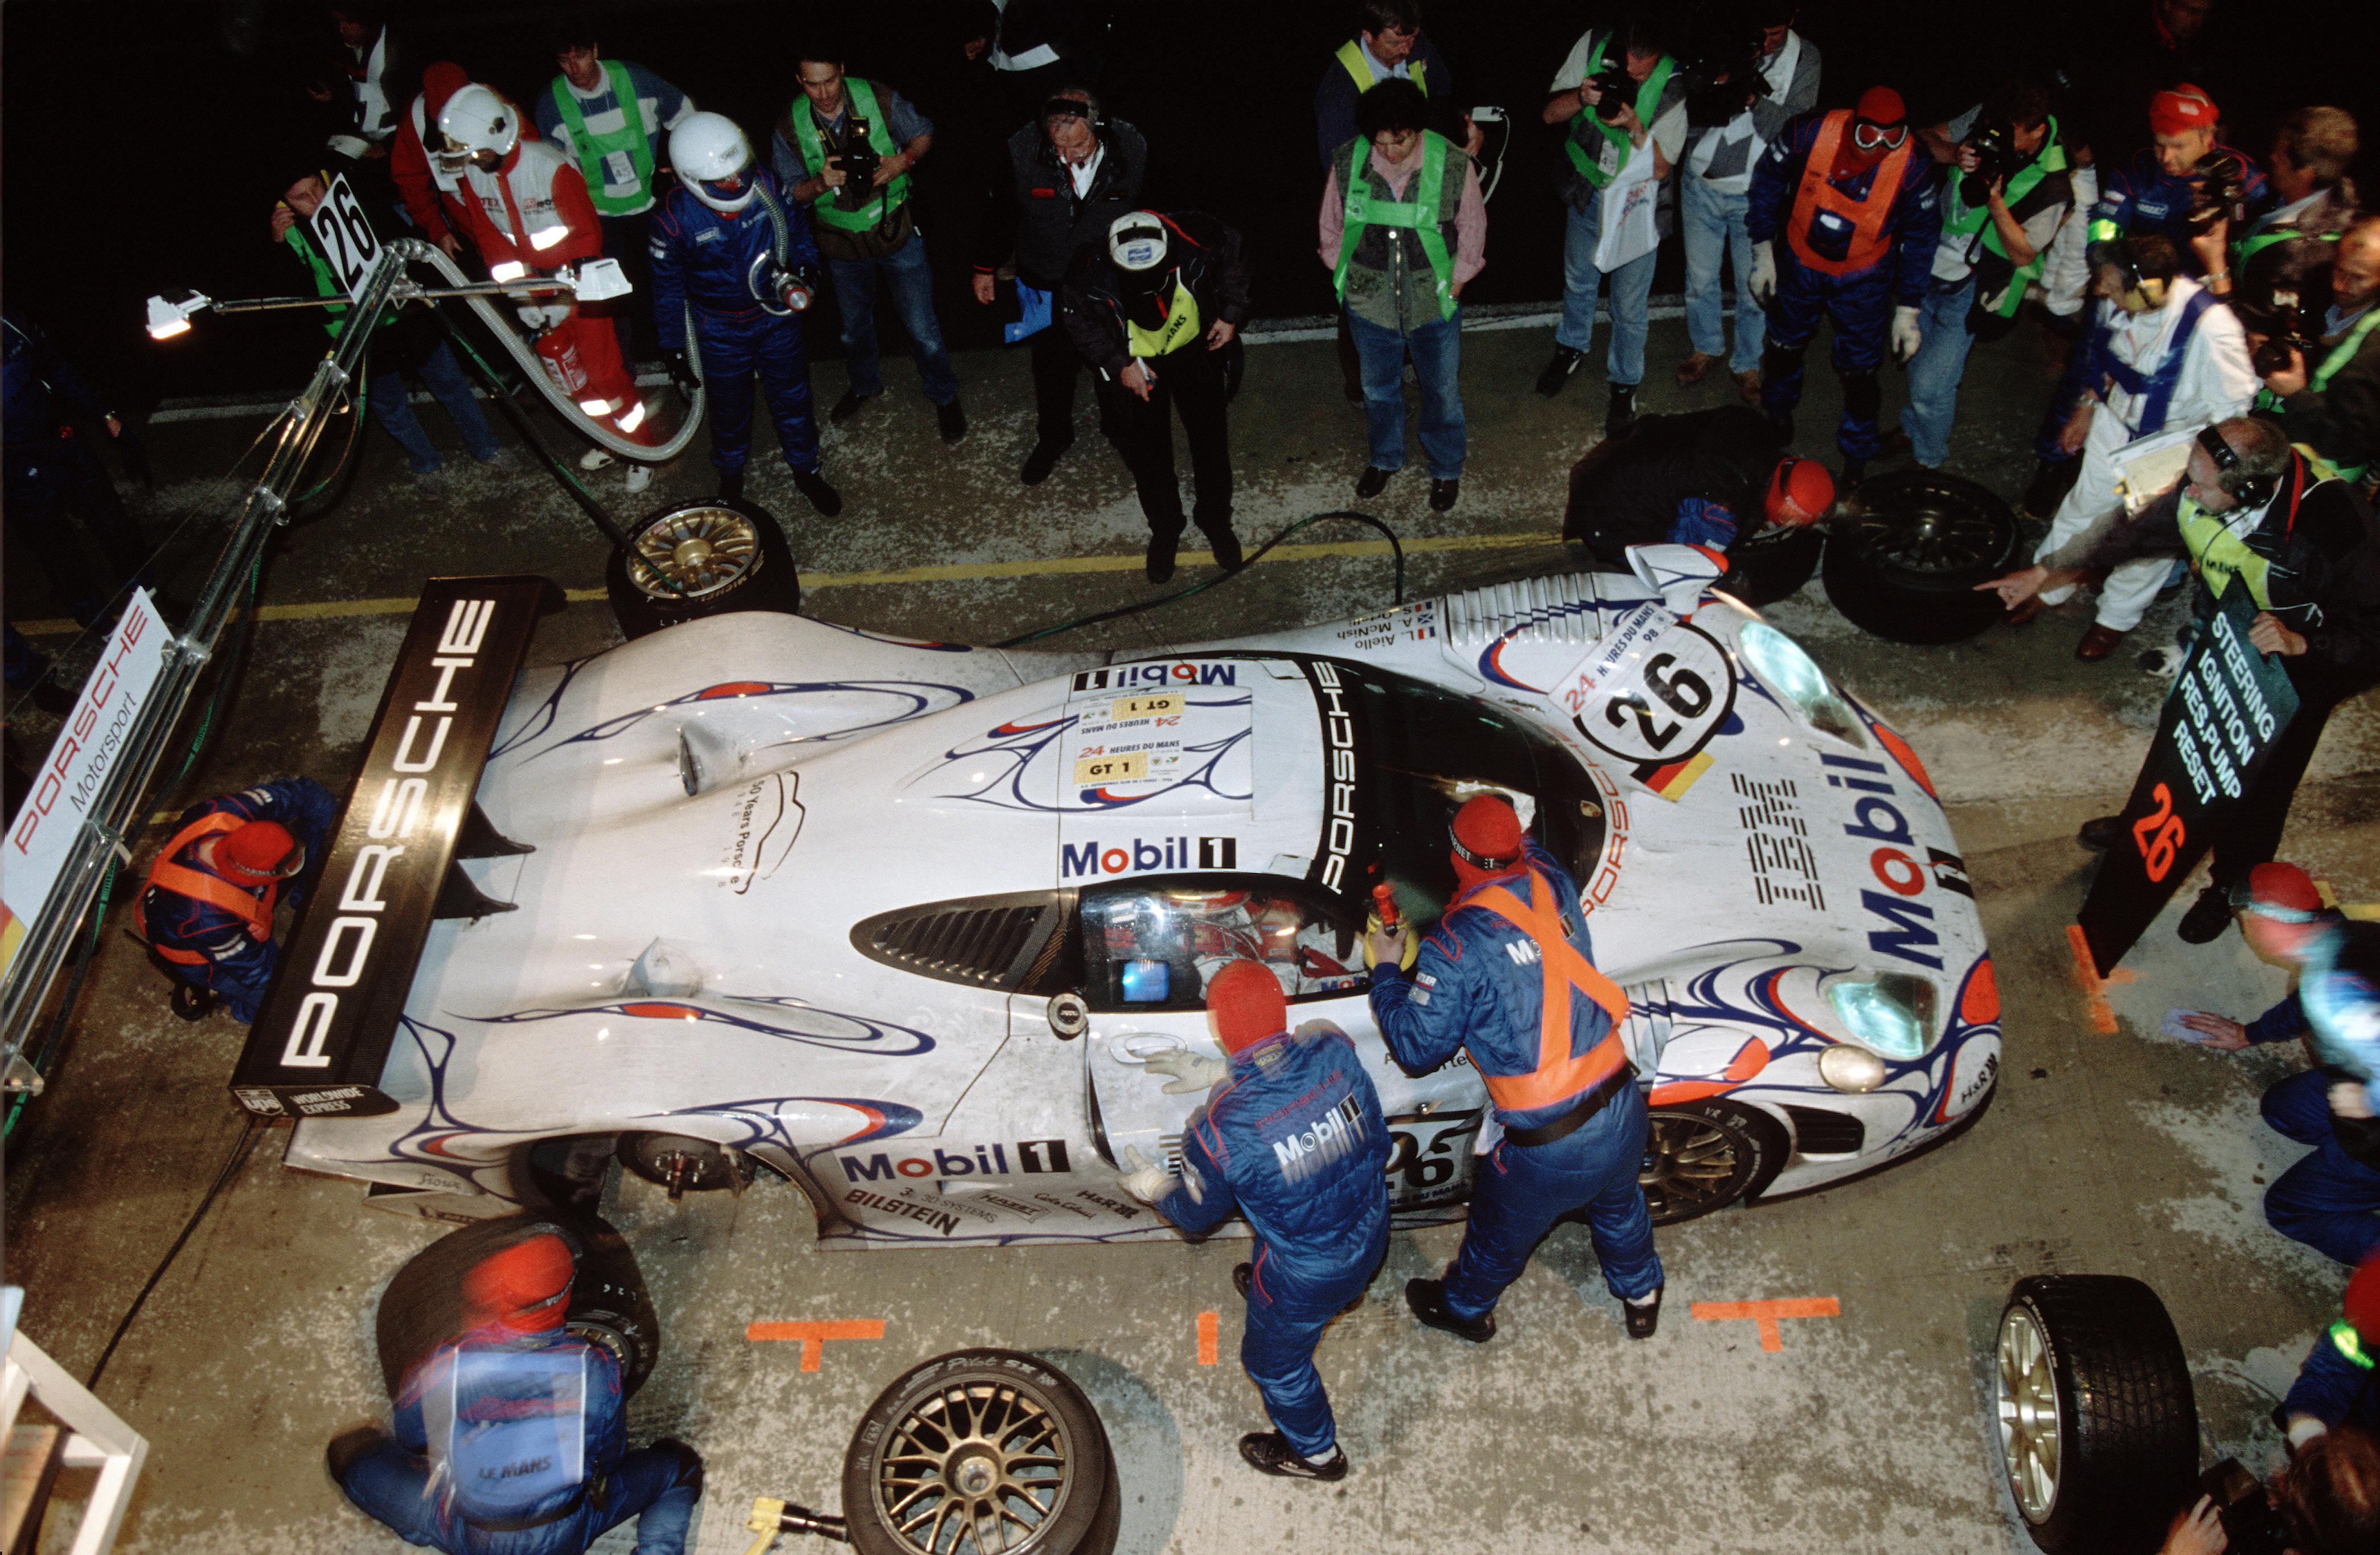 m11_2532_fine Wonderful 1998 Porsche 911 Gt1 Specs Cars Trend